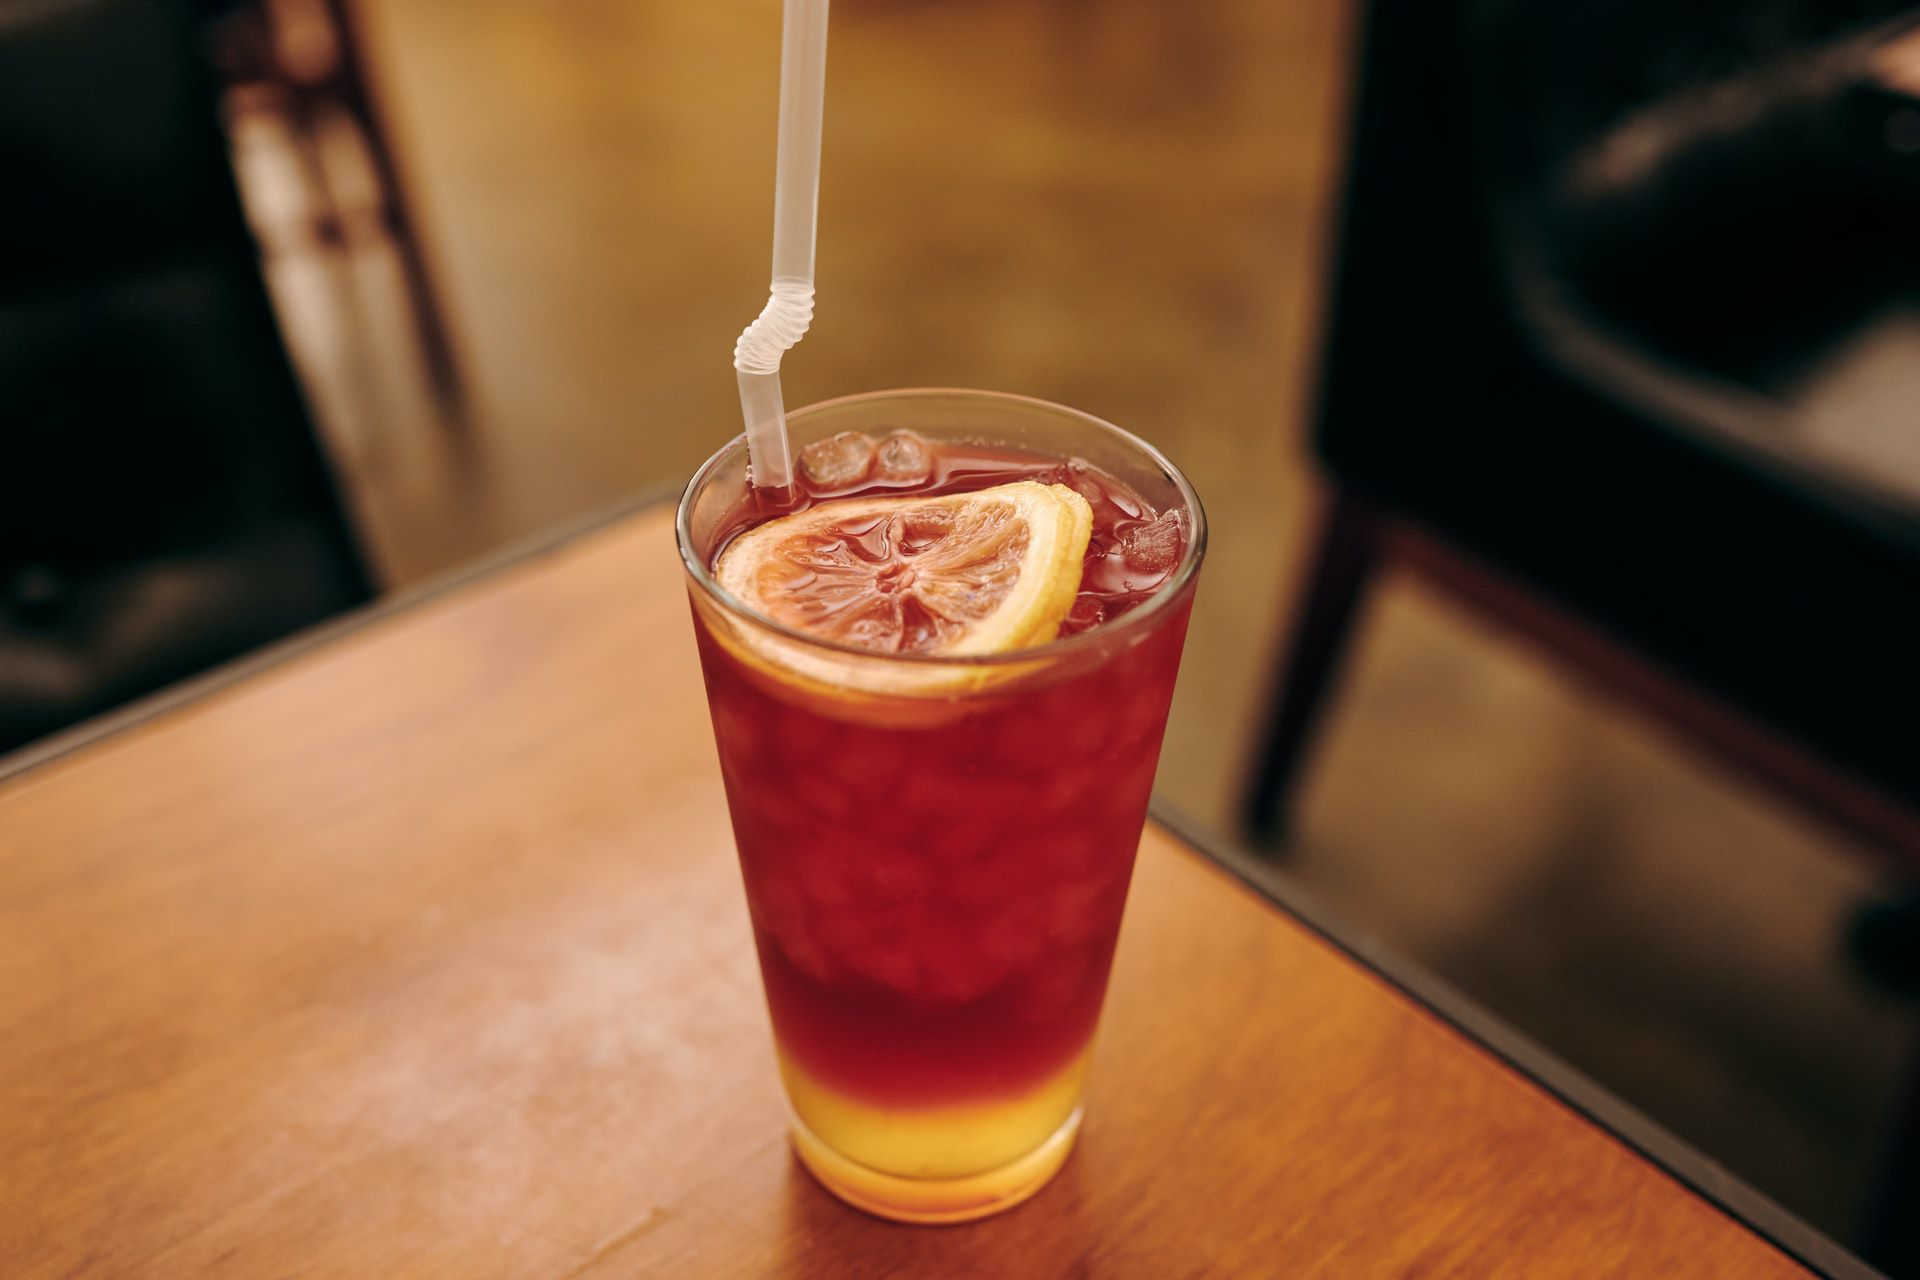 Glass of rhubarb iced tea topped with a lemon